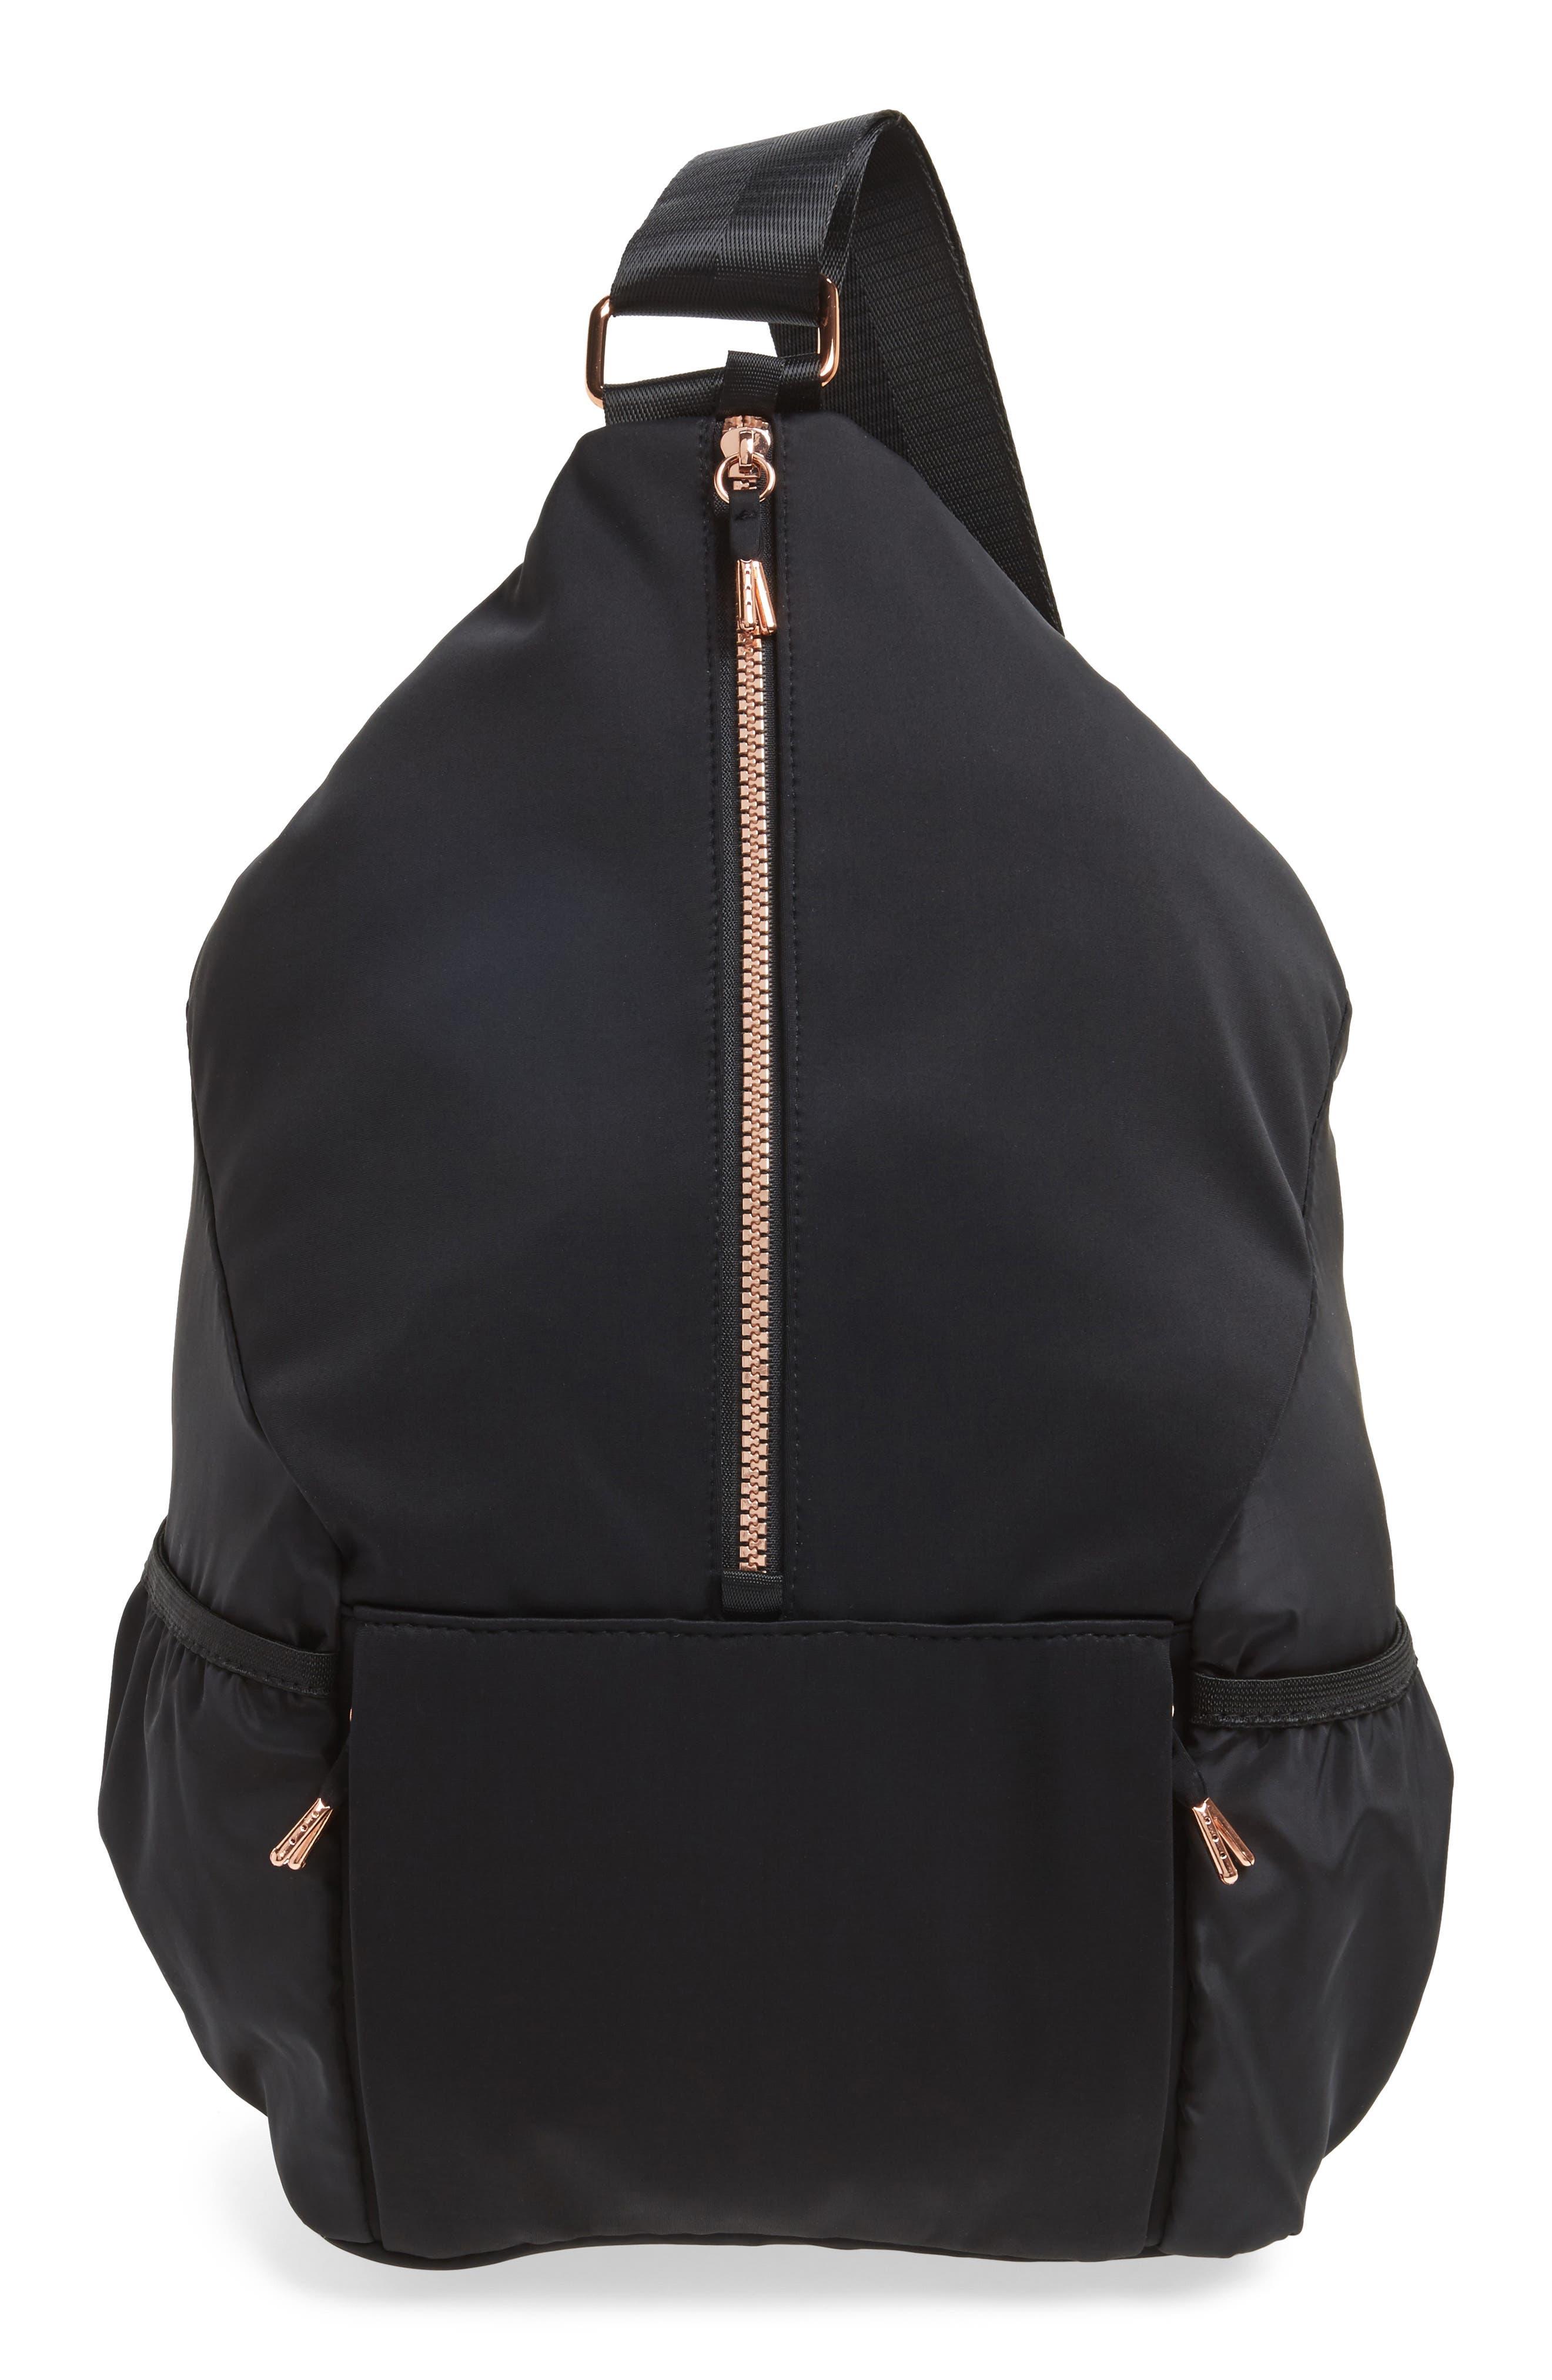 Zella Studio Sling Backpack